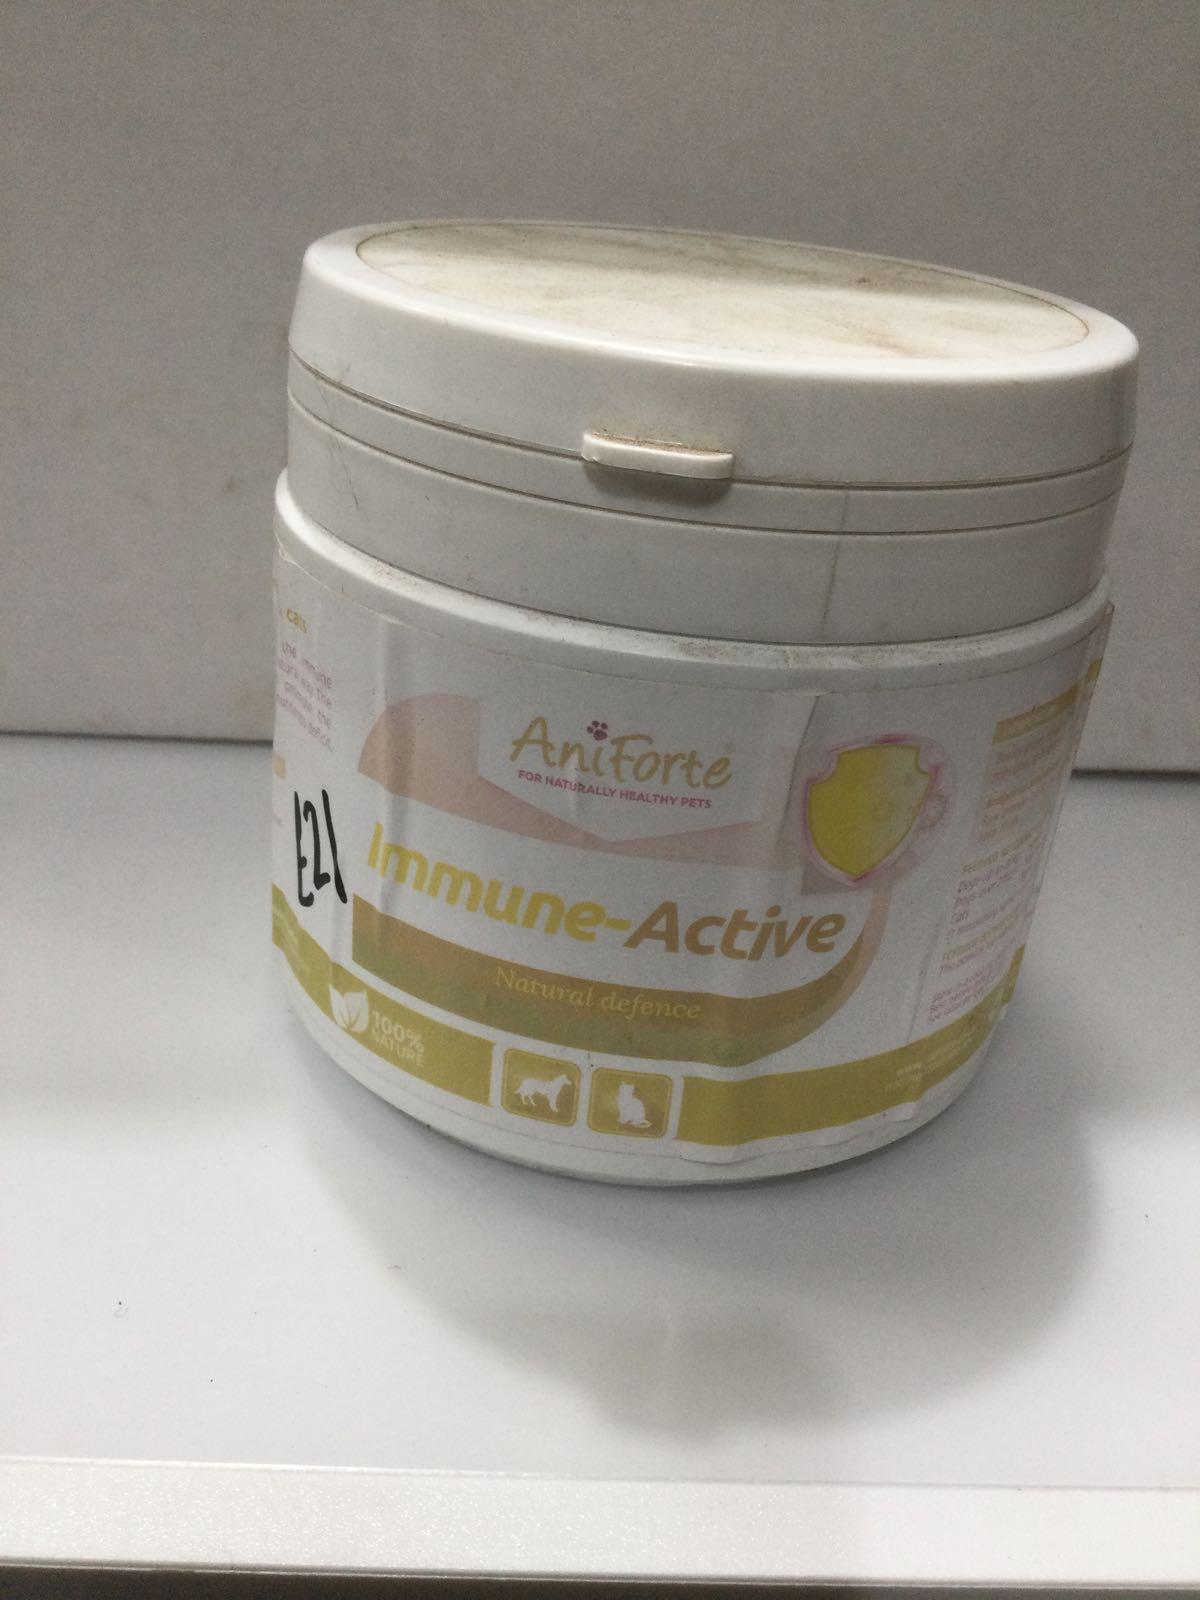 Aniforte immune active